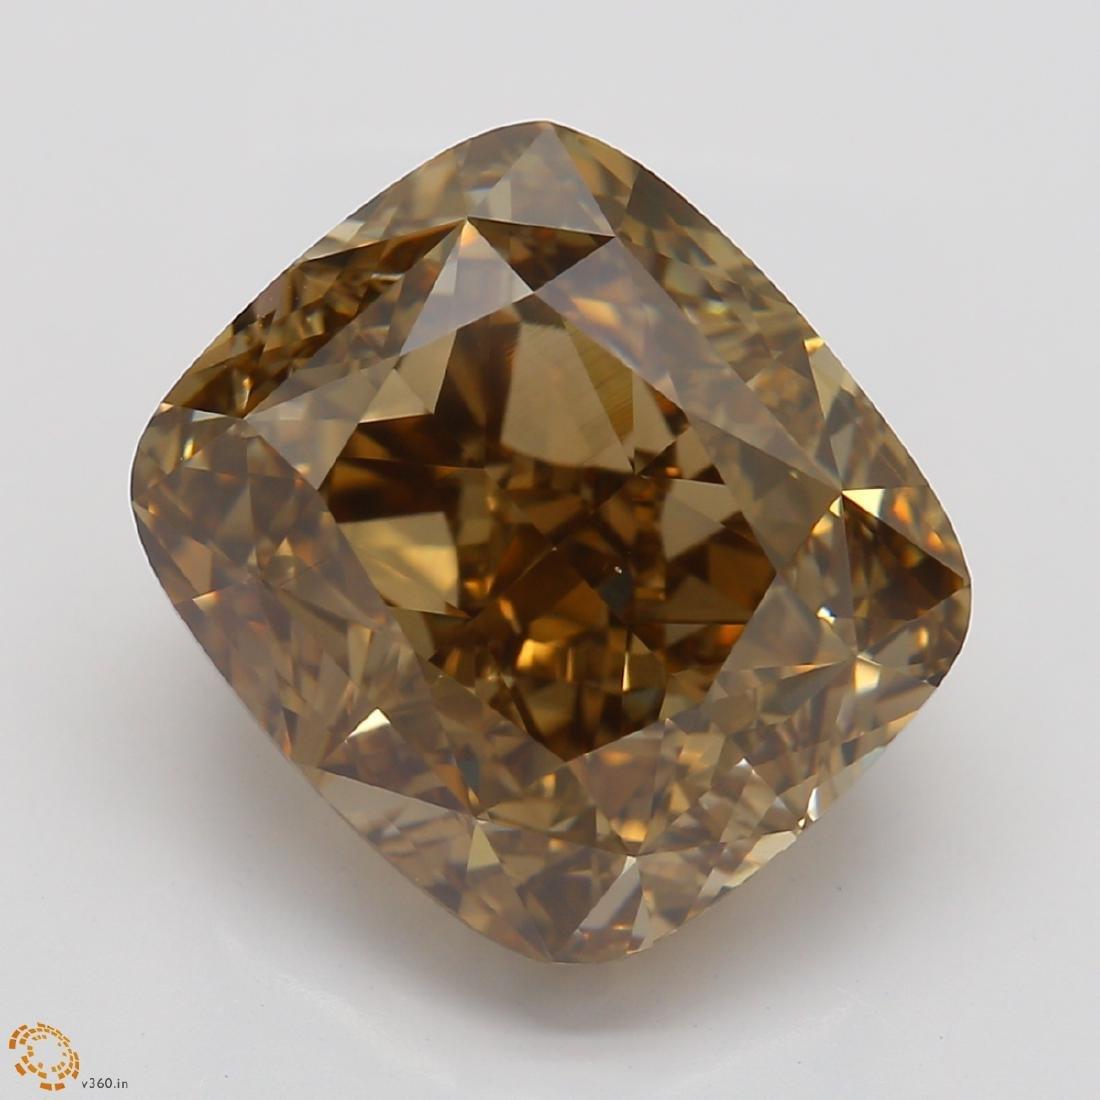 5.03 ct, Yellow Brown/VS1, Cushion cut Diamond